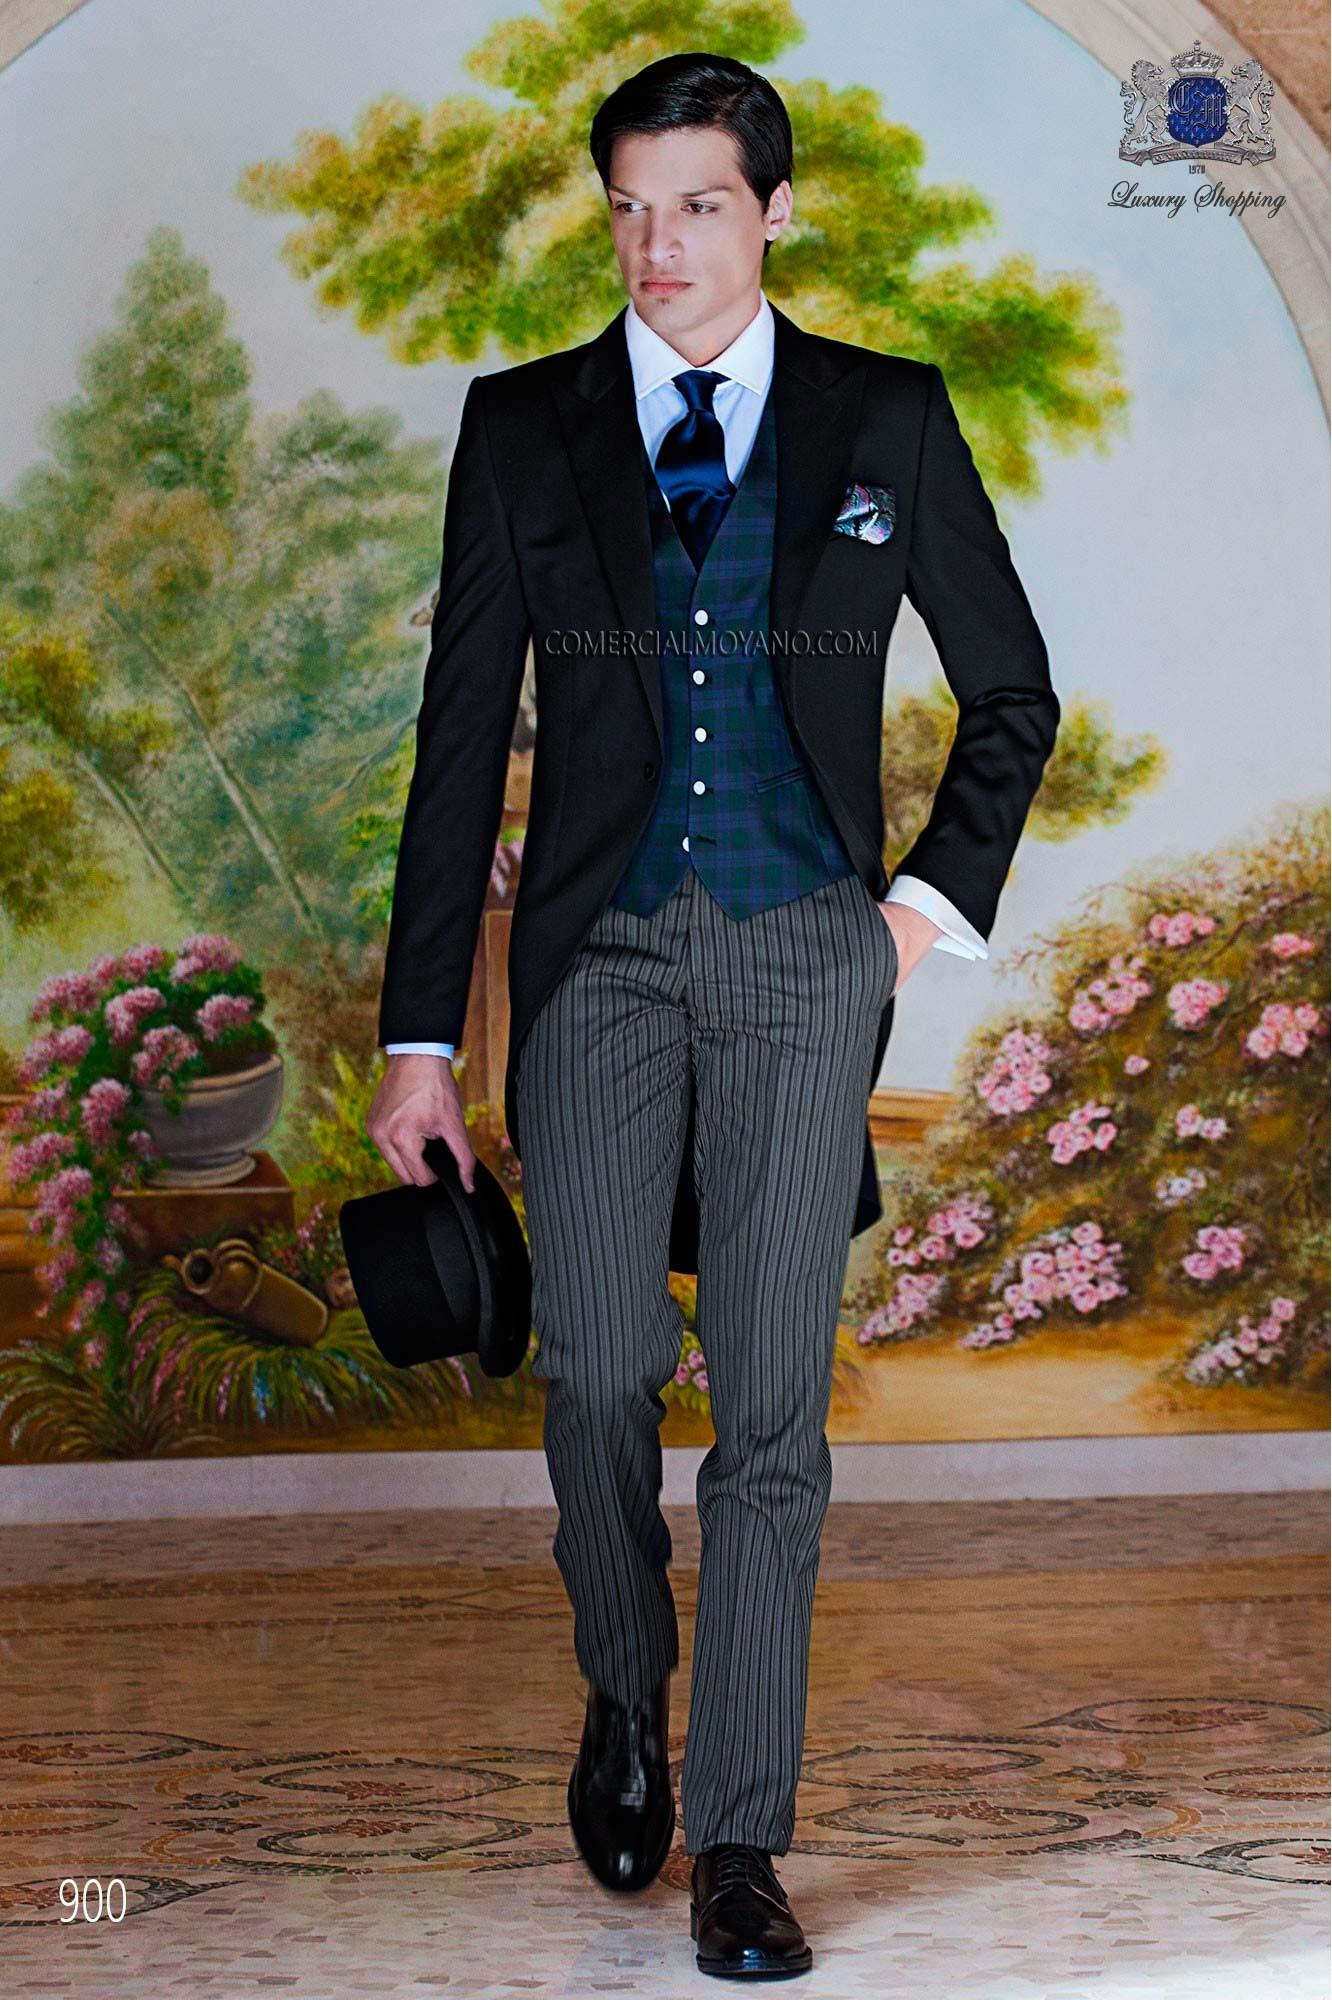 Gentleman black men wedding suit model 900 Ottavio Nuccio Gala